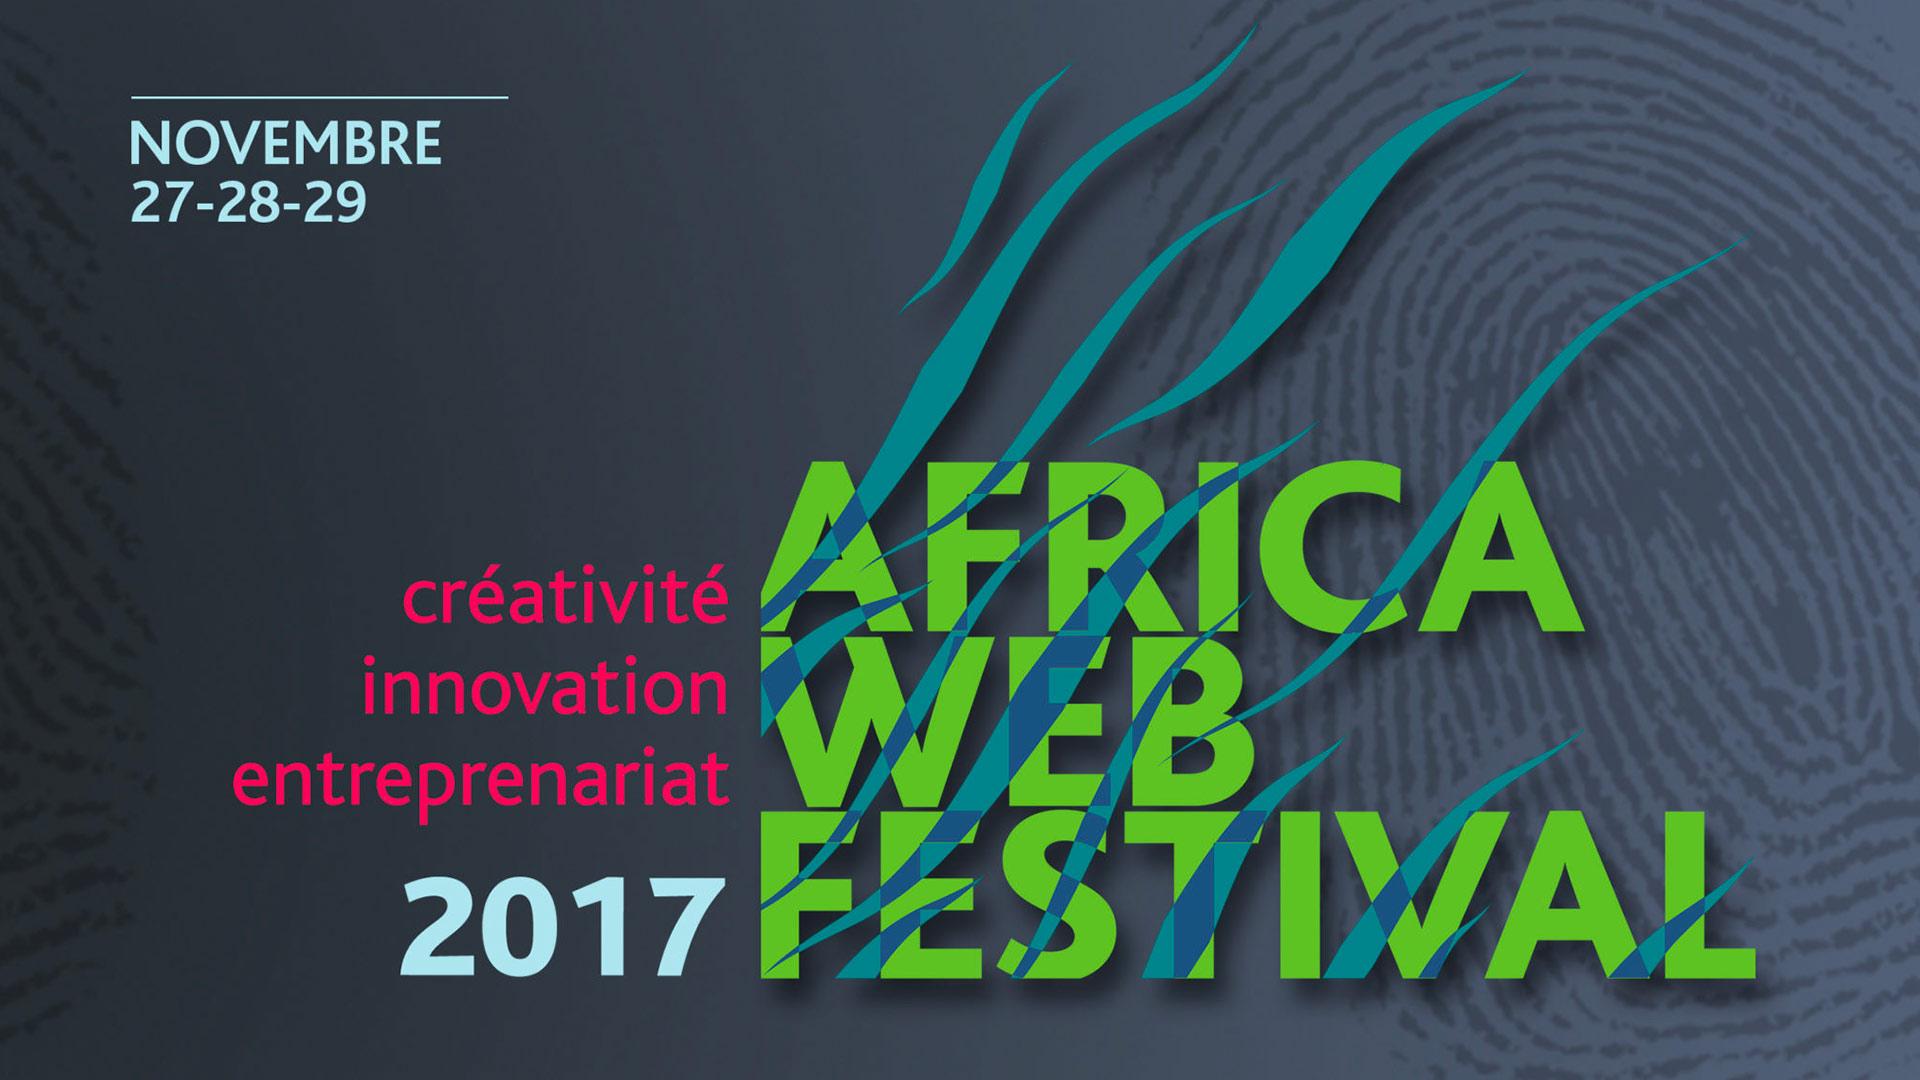 Africa Web Festival